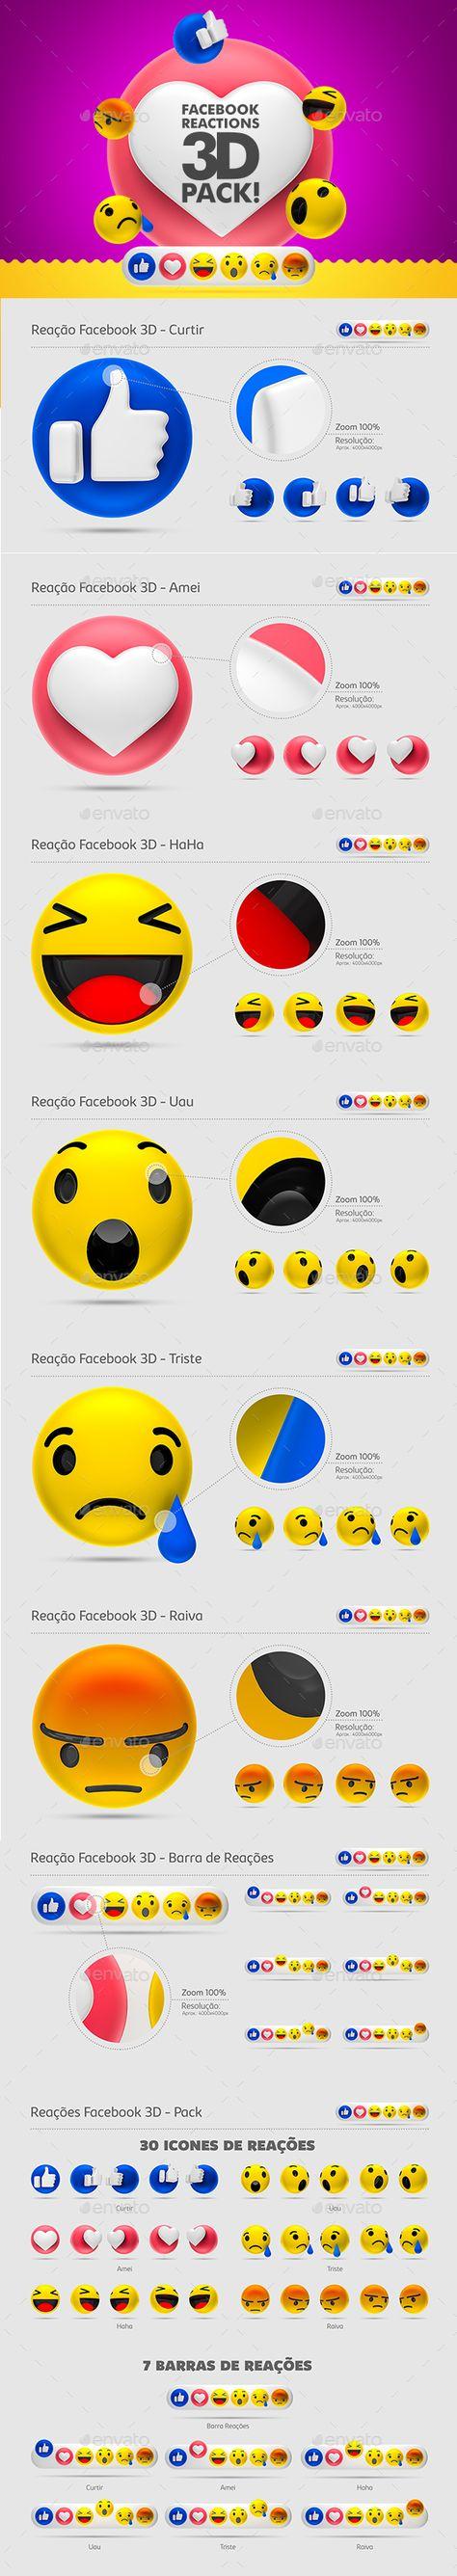 3D Graphics & Renders - Facebook Reactions - 3D Pack!